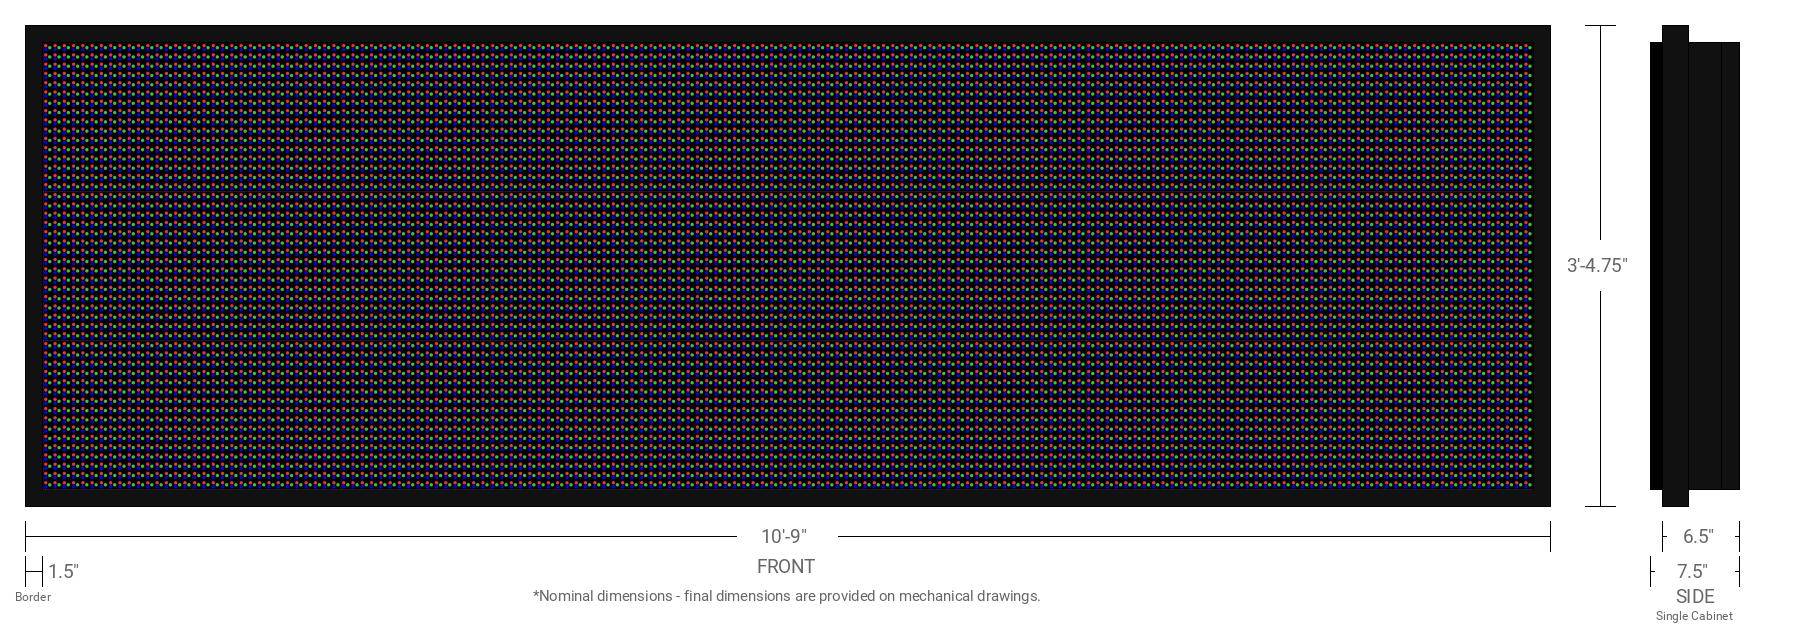 Aurora 20mm 48x160 Single Sided Full Color LED Display